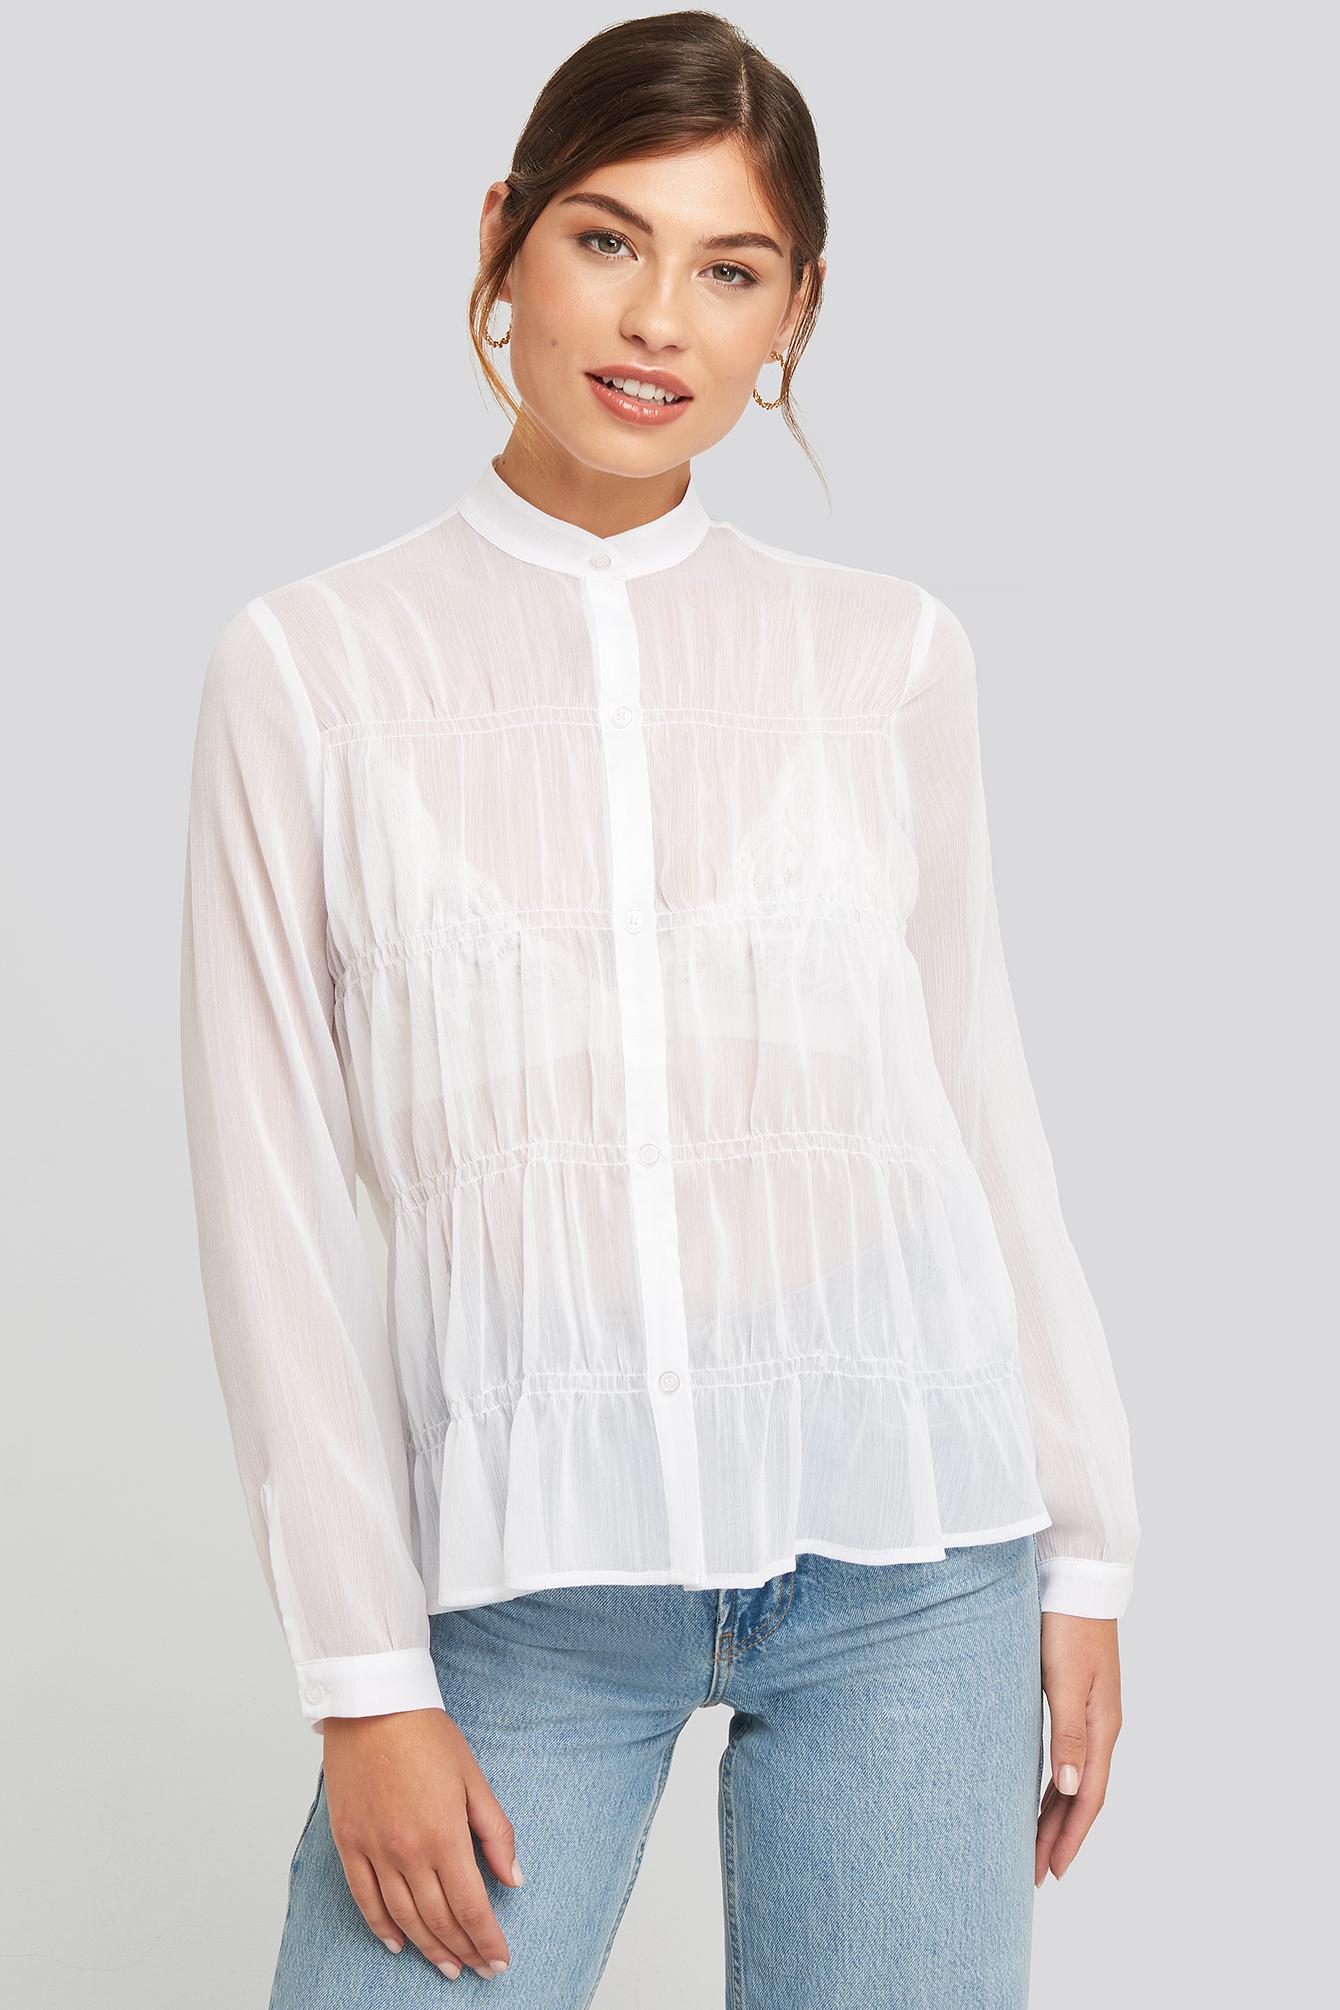 NA-KD Boho Gatherings Detail Chiffon Shirt - White